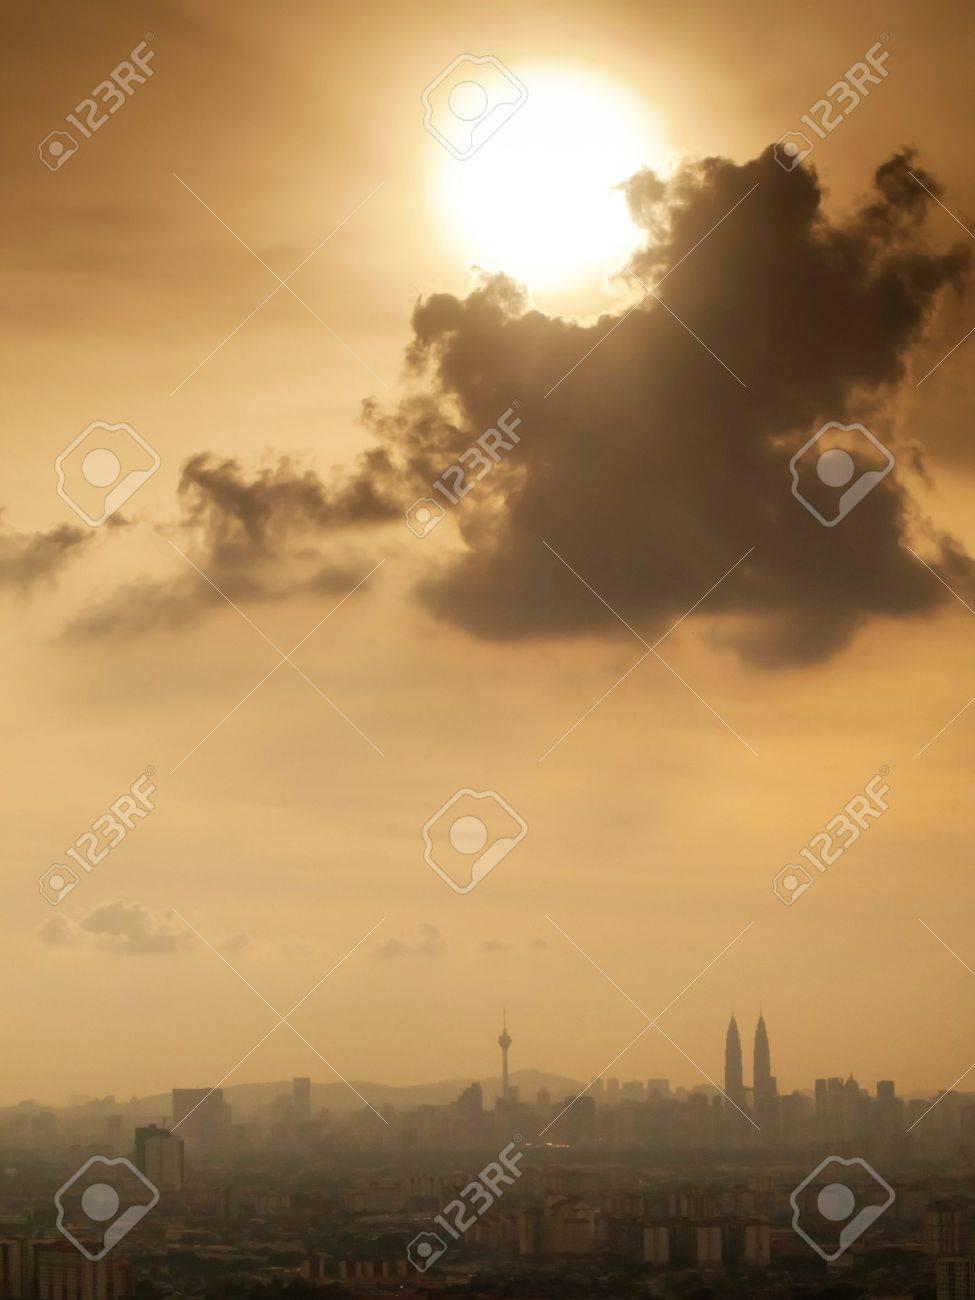 Kuala Lumpur skyline under dramatic sky with shining sun Stock Photo - 7595896